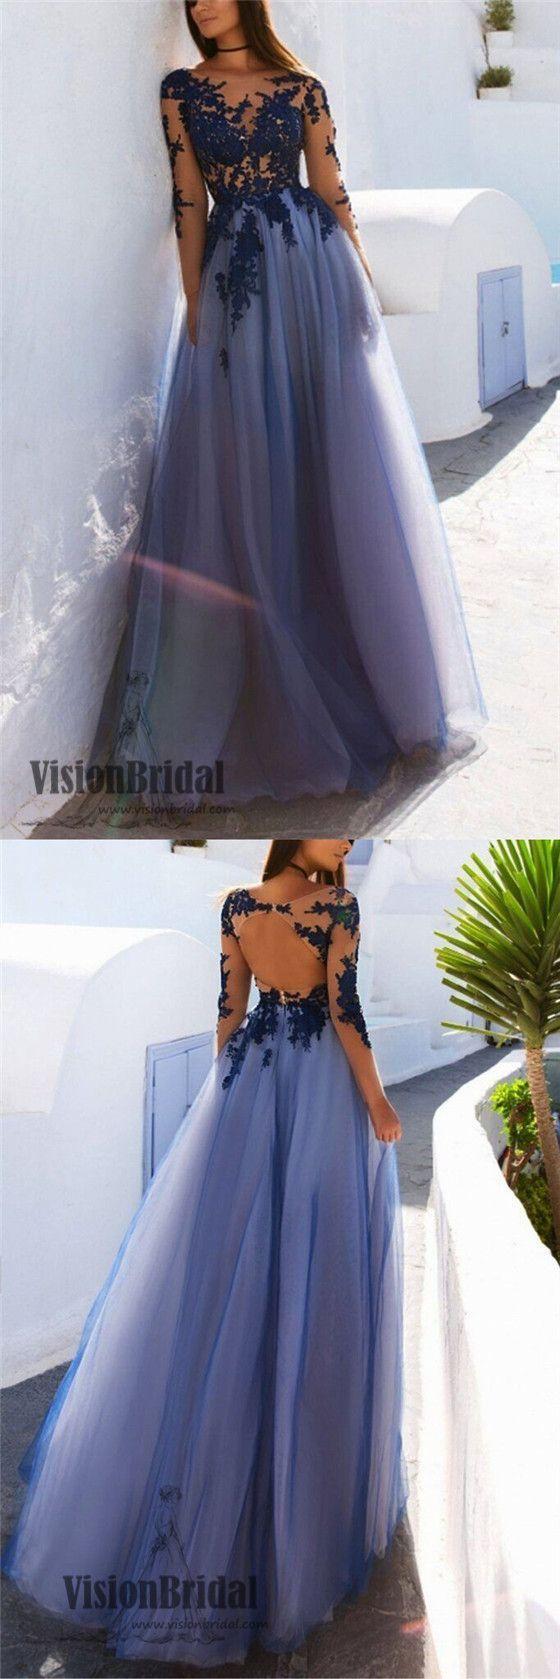 Scoop Neckline Long Sleeves Lace Yarn Top Prom Dress, Open Back A-Line Long Prom Dress, Prom ...